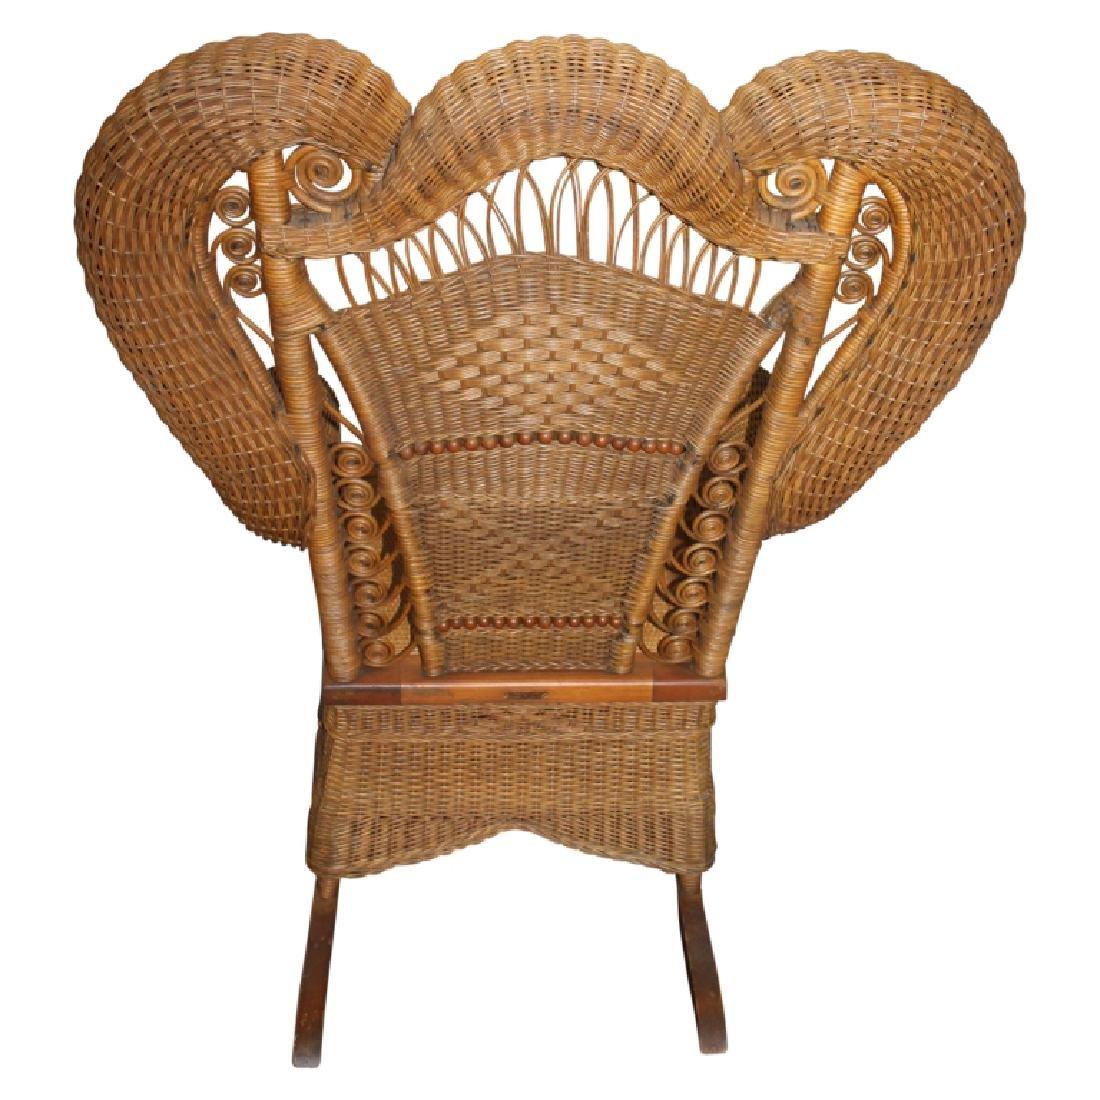 Heywood Wakefield Wicker Style Rocking Chair - 2